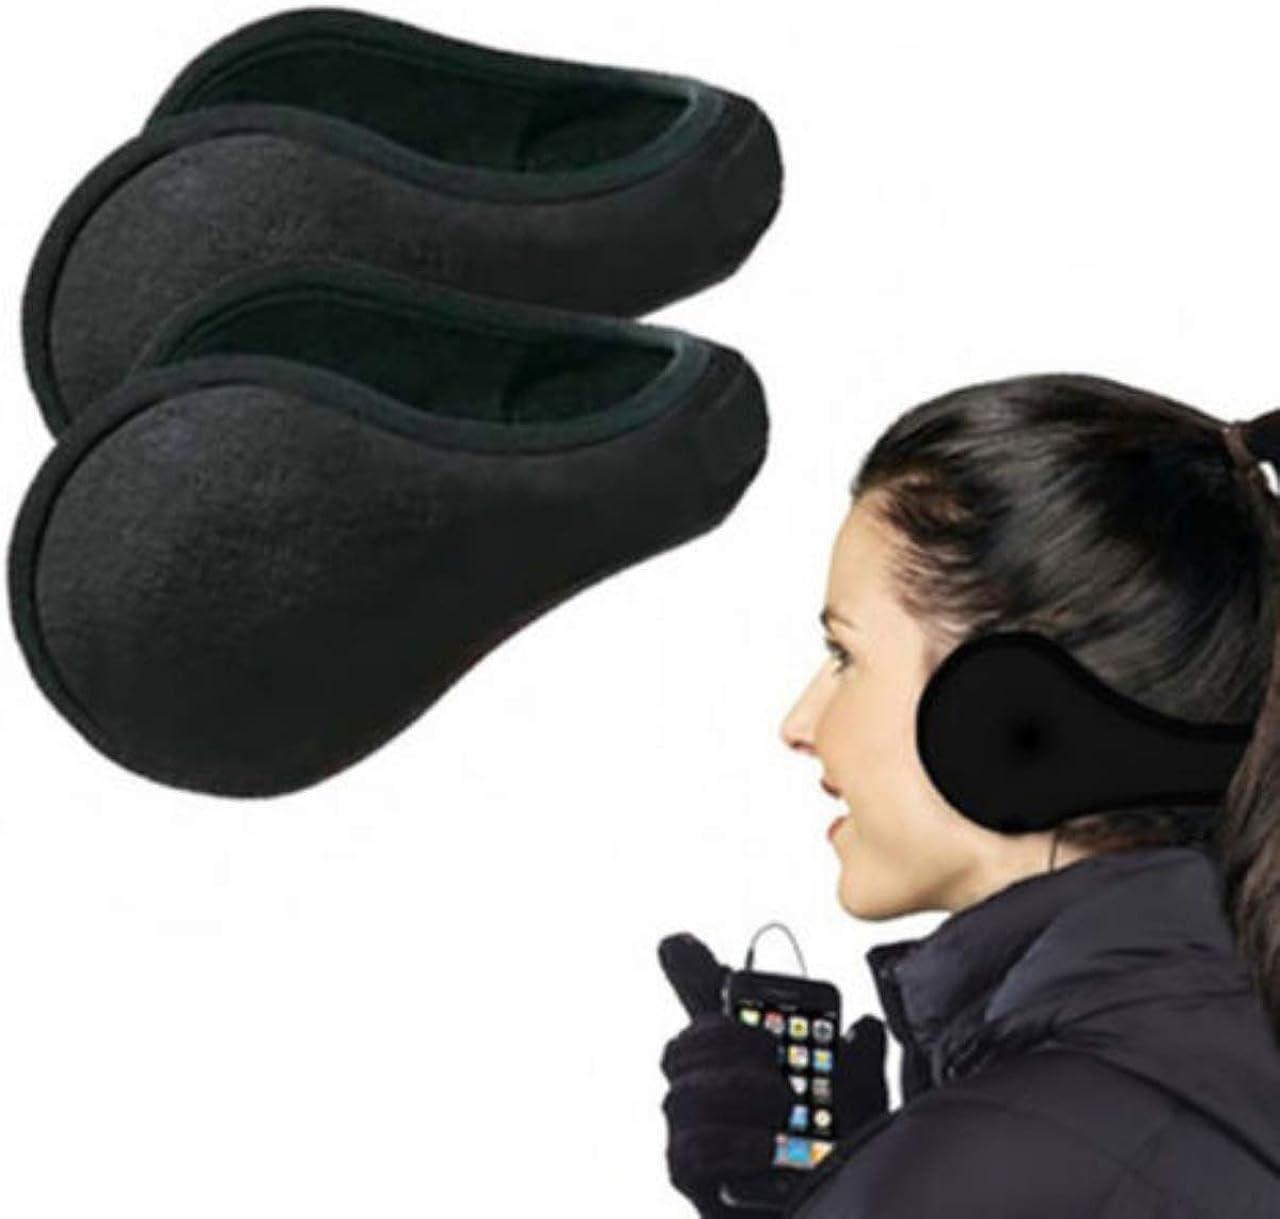 2 Ear Muffs Winter Ear warmers Fleece Earwarmer Mens Womens Behind the Head Band